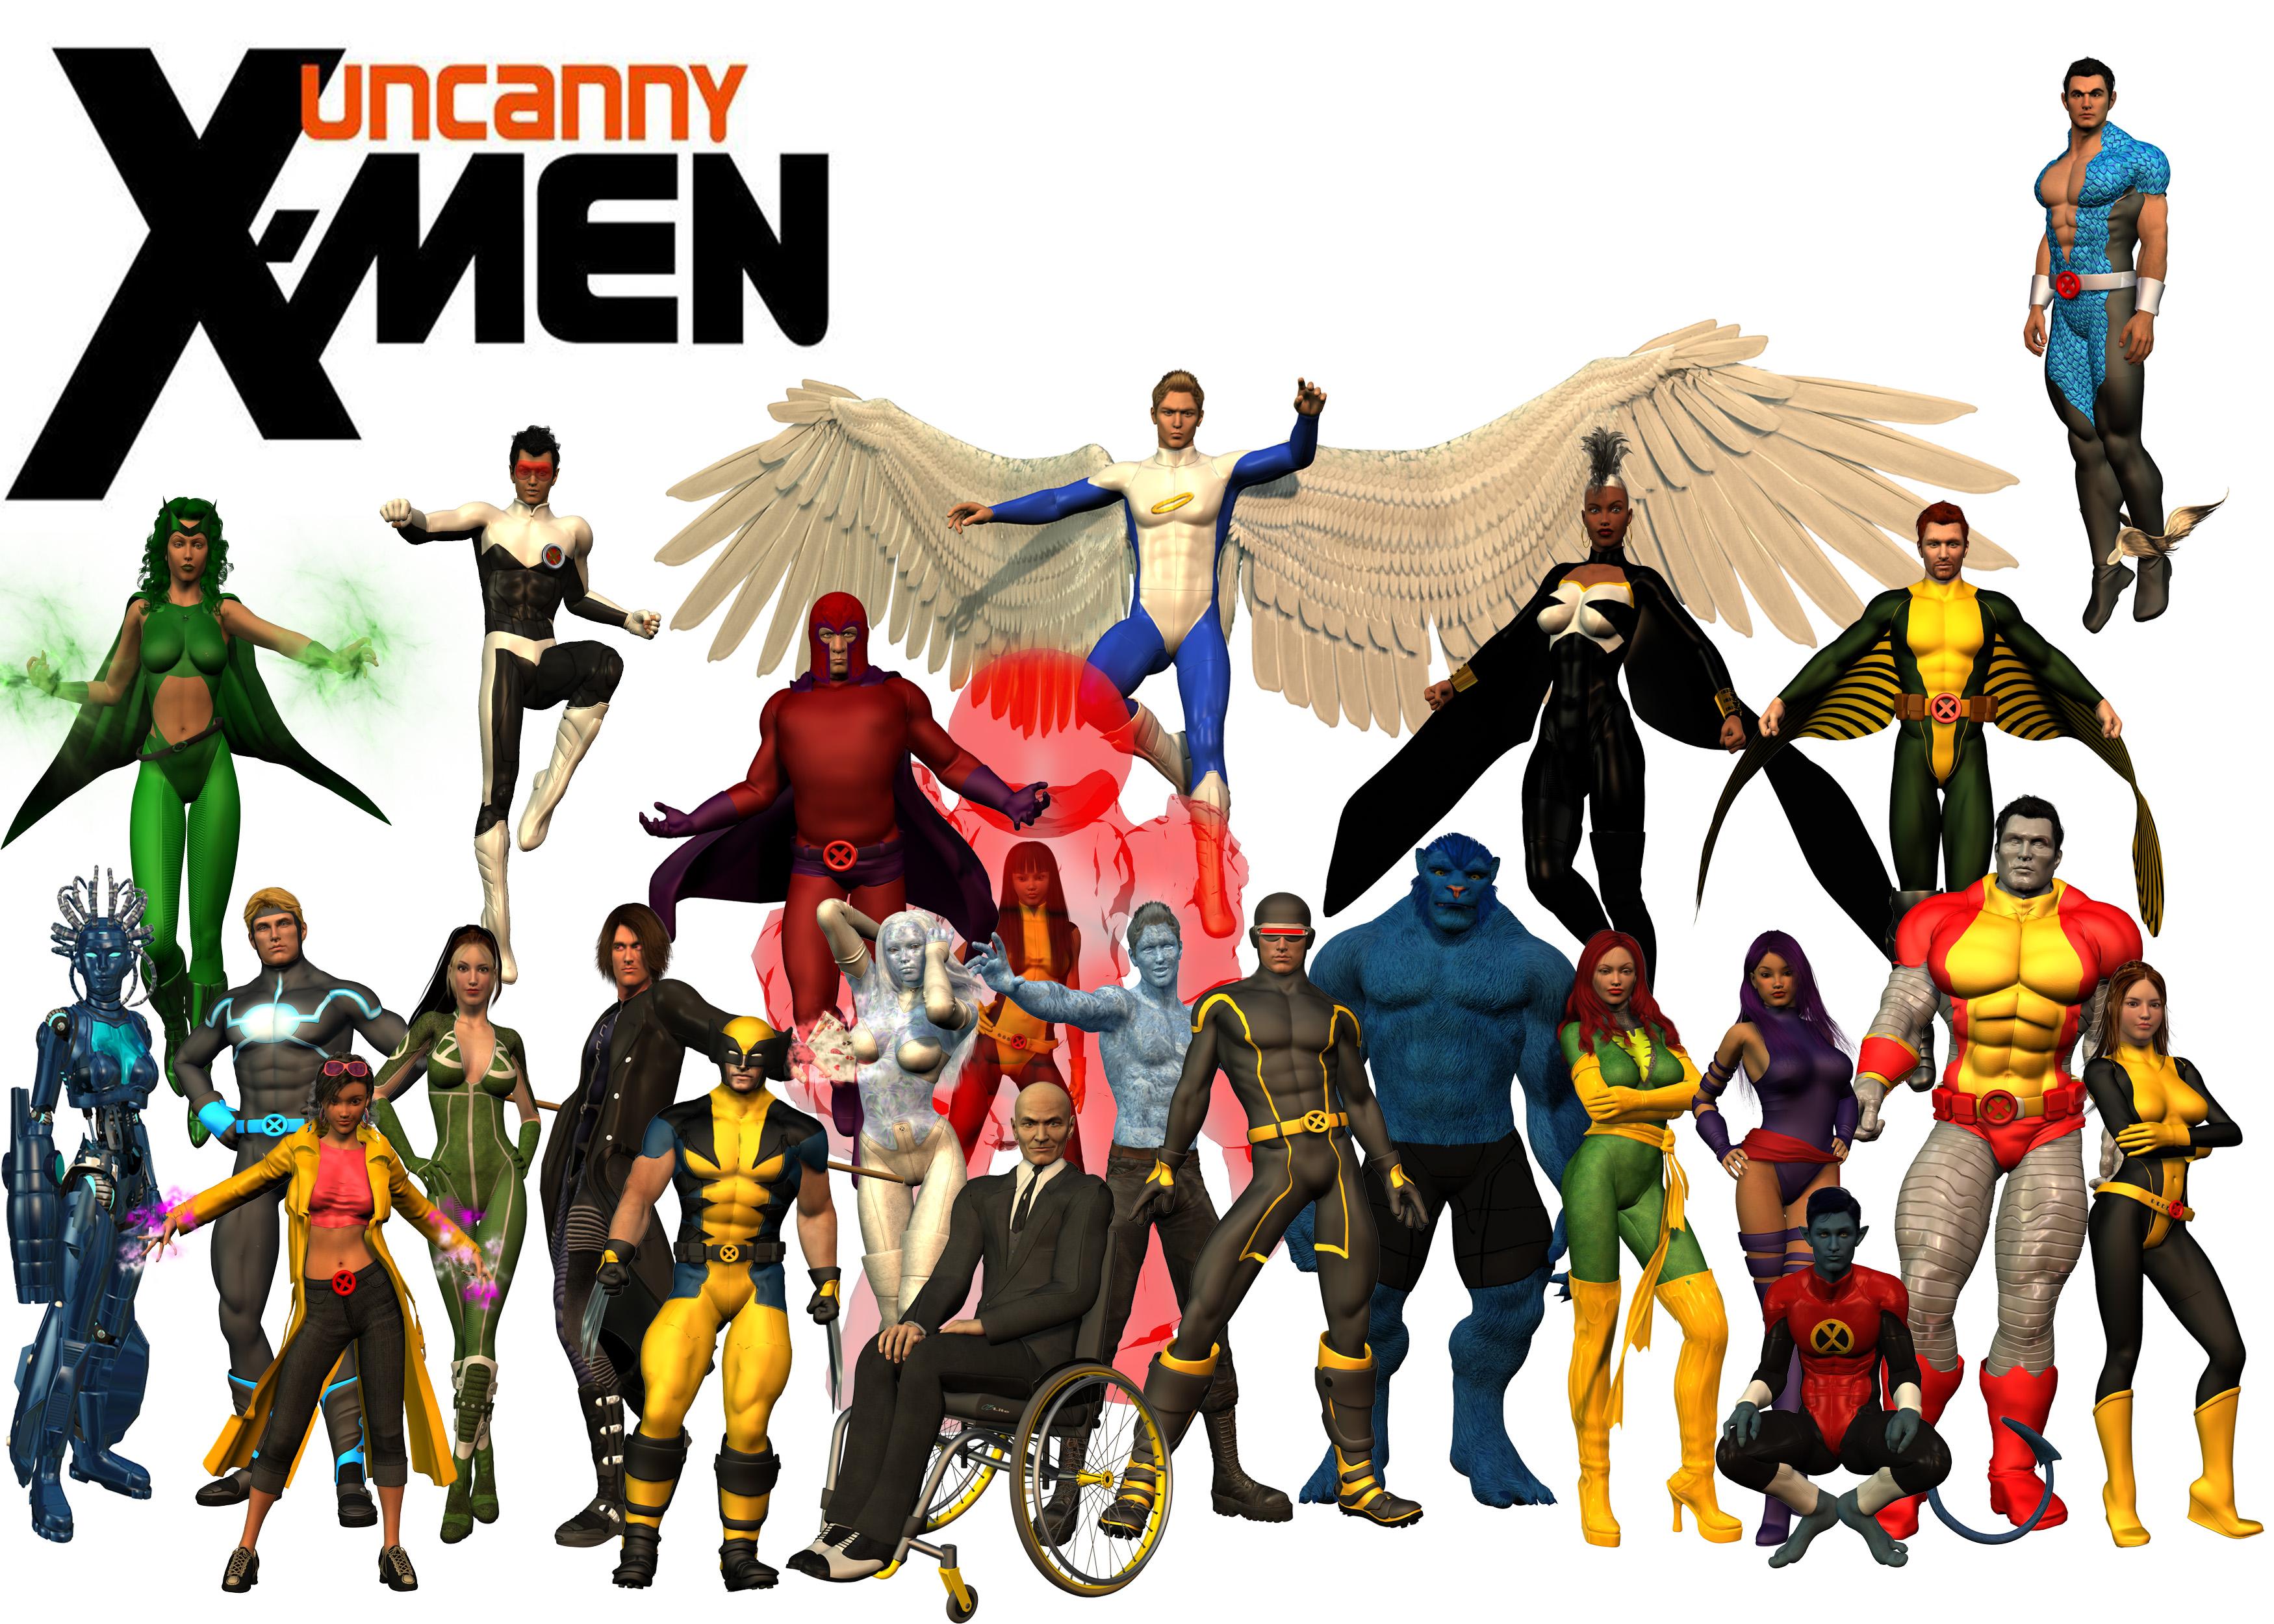 Download Uncanny X Men By Dragonspawn2000 3500x2500 49